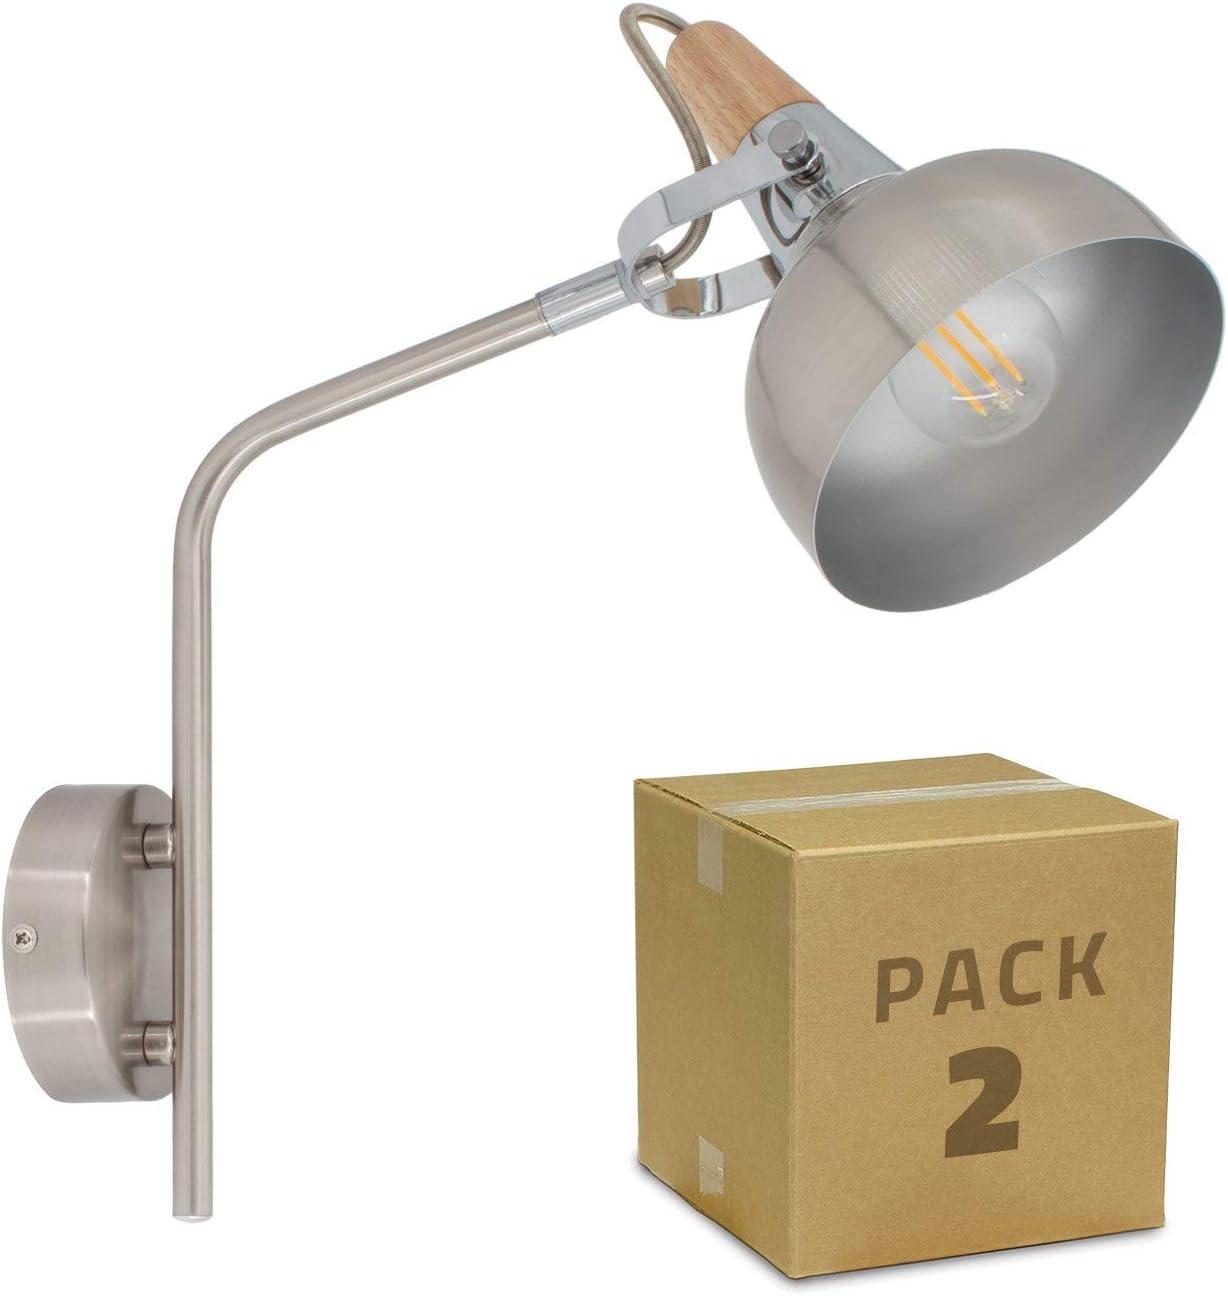 LEDKIA LIGHTING Pack Aplique Orientable Brazo Superior Emer 1 Foco Plata (2 un) PlataPlata: Amazon.es: Iluminación